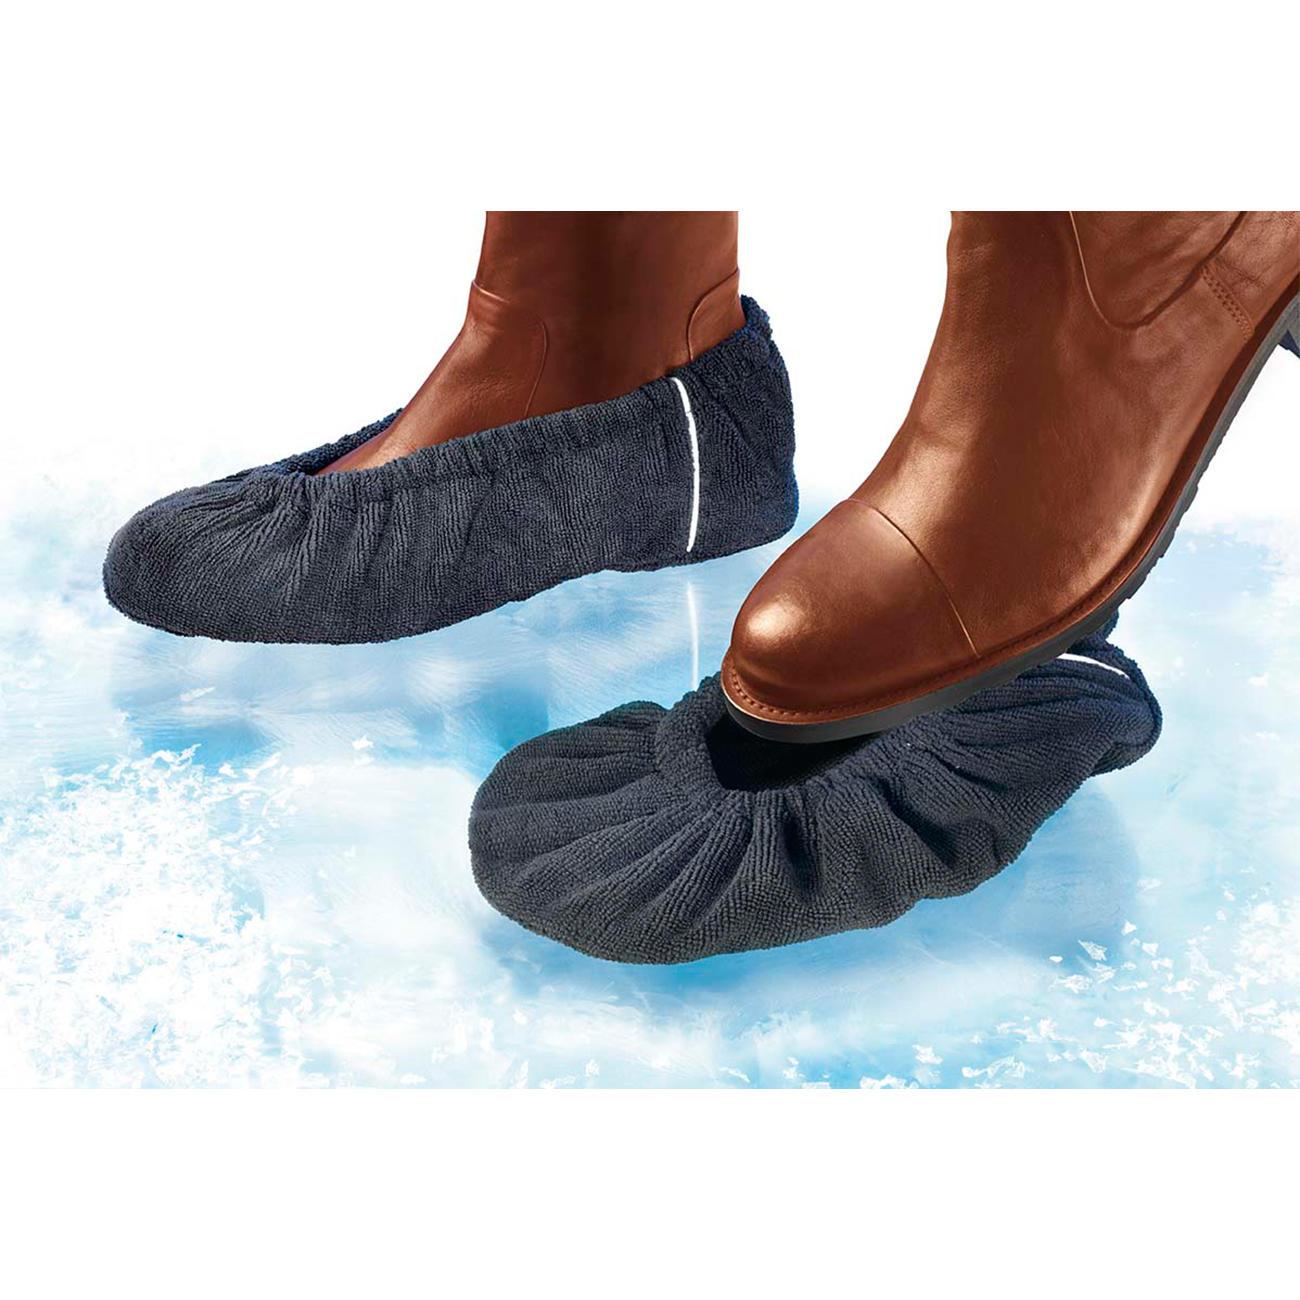 buy non slip shoe covers 2 pair